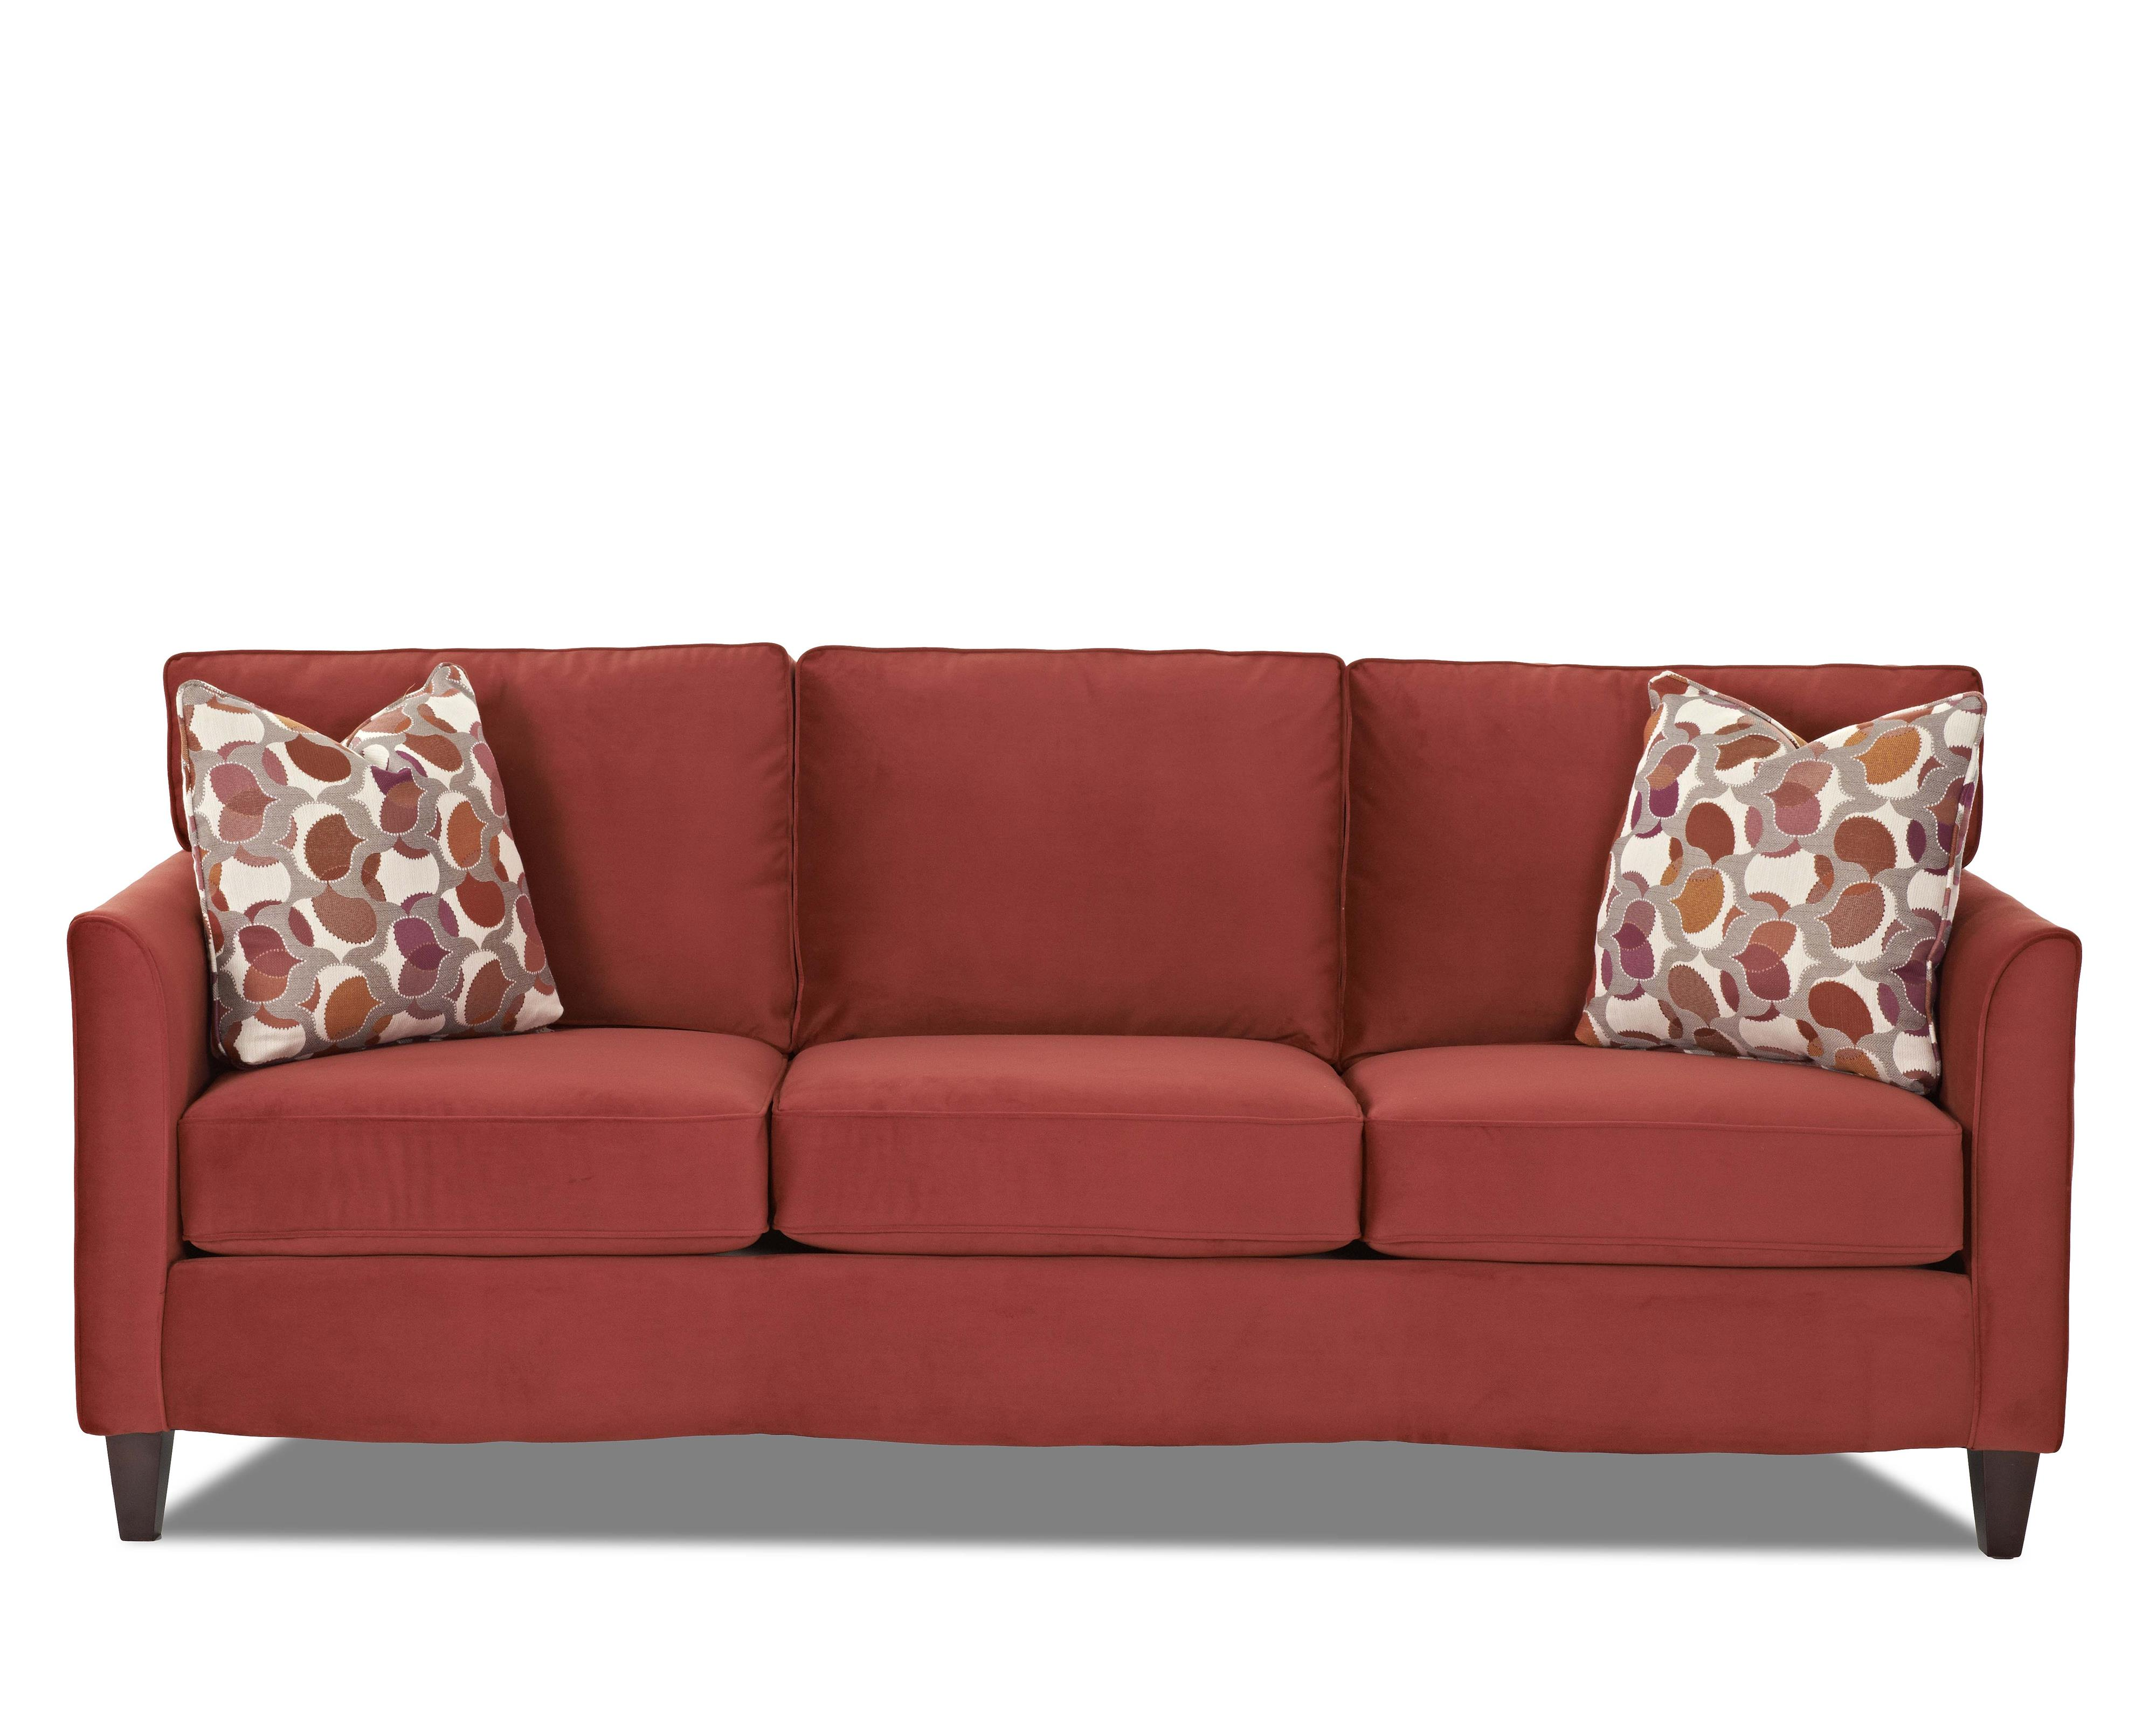 Klaussner Hopewell  Sofa - Item Number: K17200 S-OakleyTomato